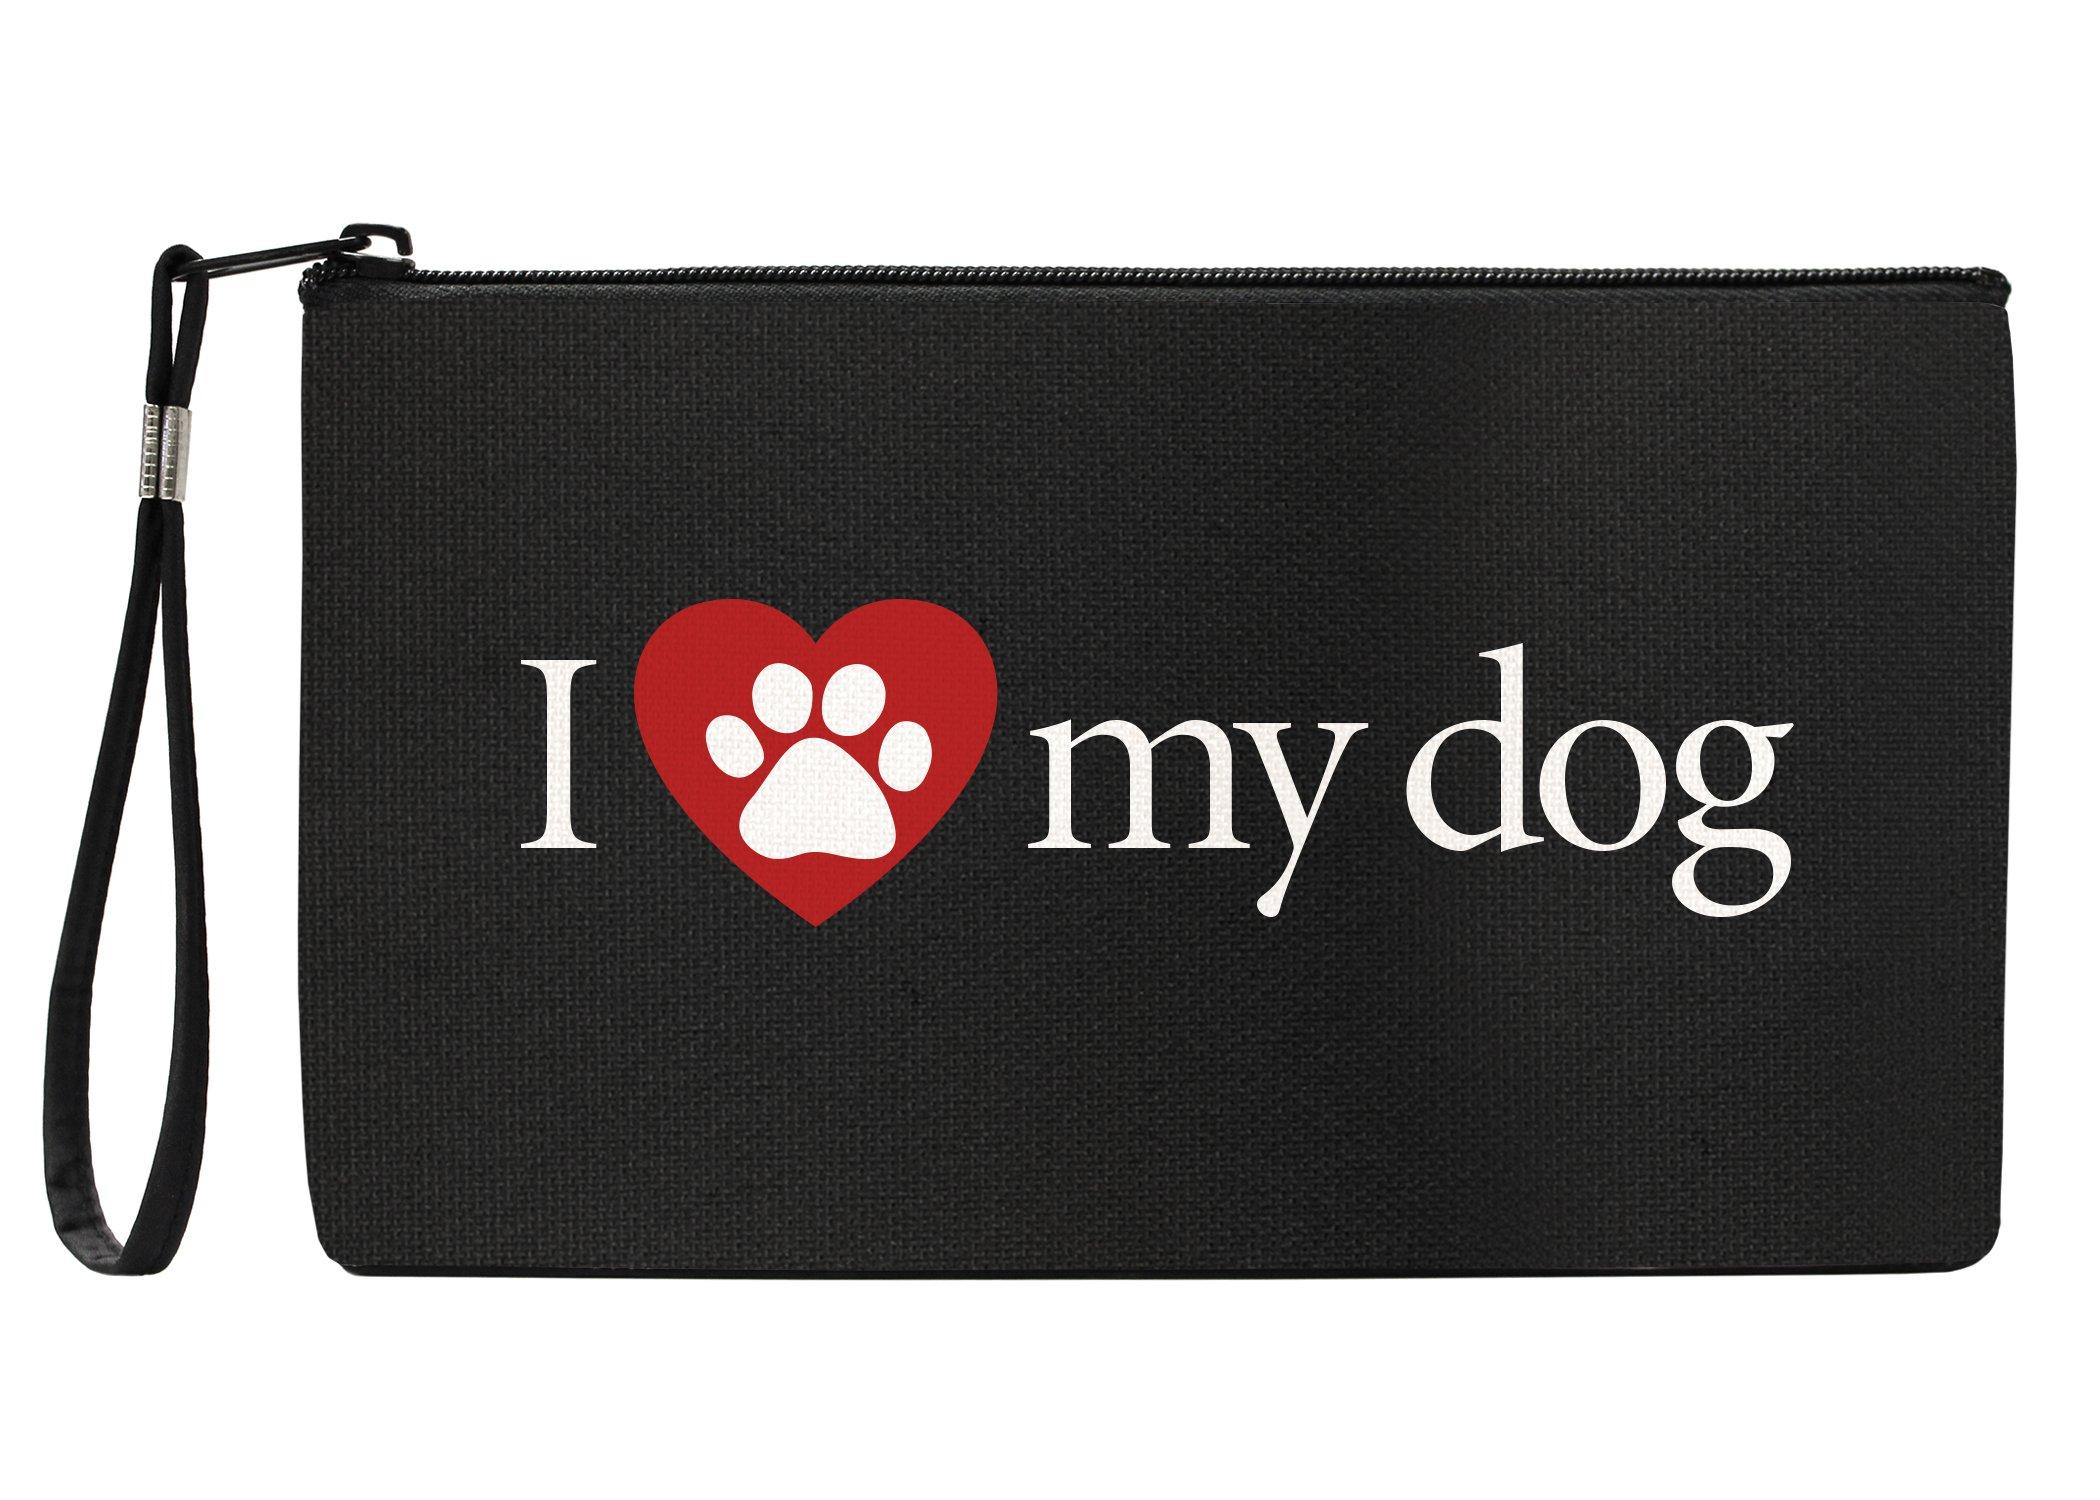 Snaptotes I Love My Dog Wristlet Clutch Purse